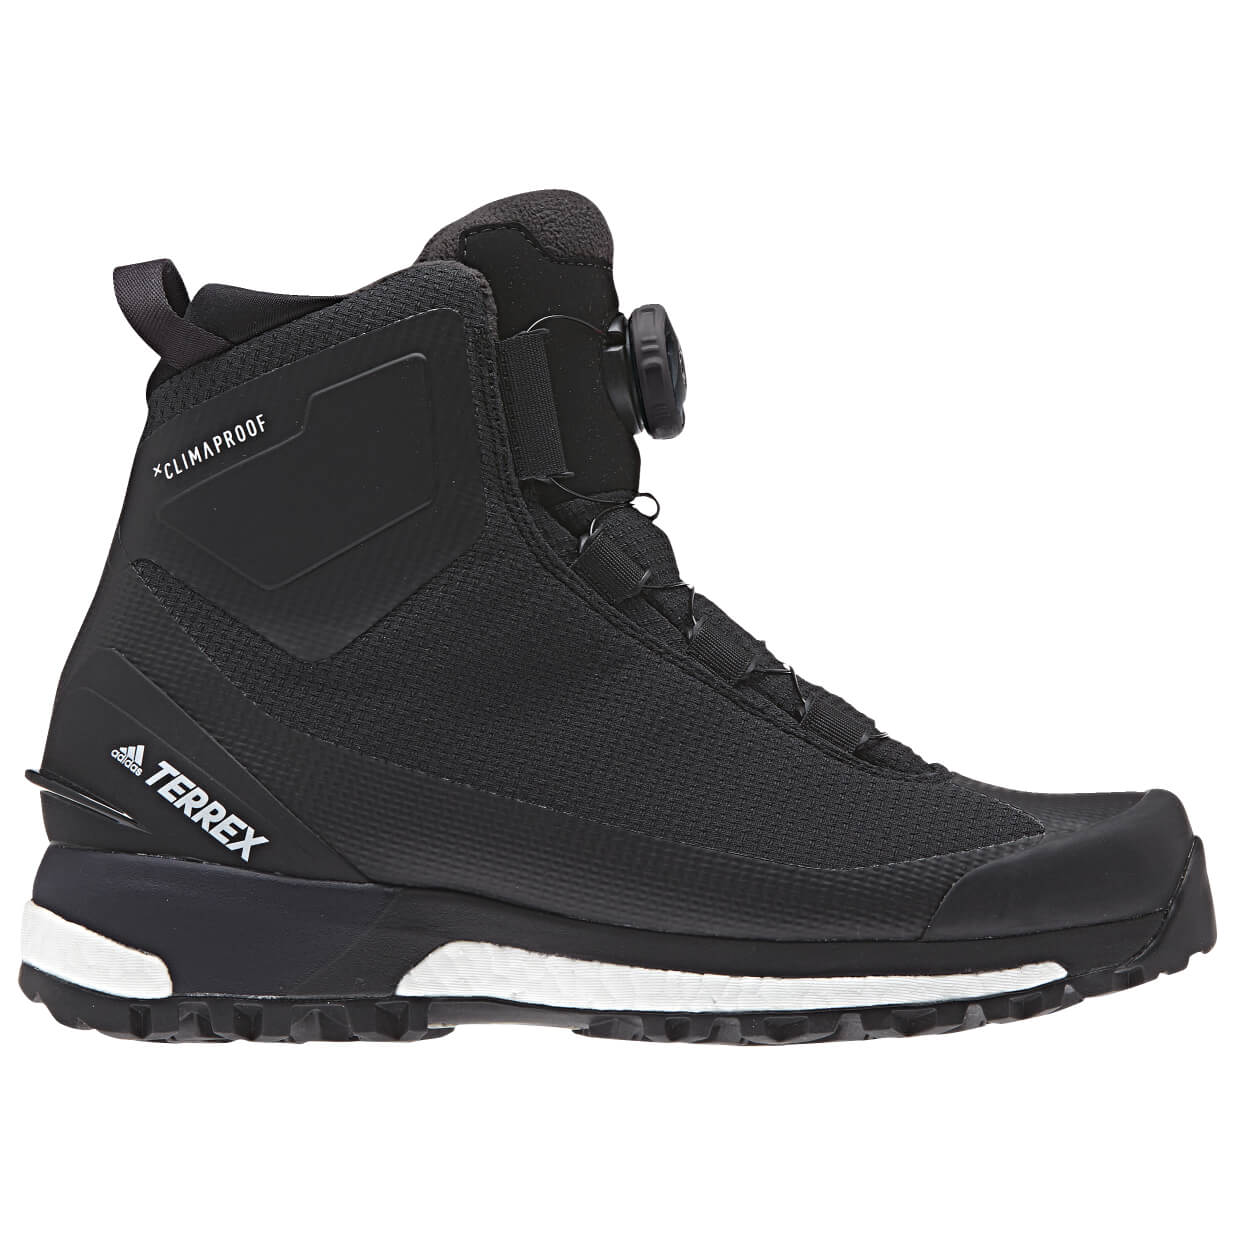 Cp Invierno White Core Conrax Adidas 5uk Boa Ftwr Energy De S177 Black Terrex Calzado Ch LGzMpqSVU